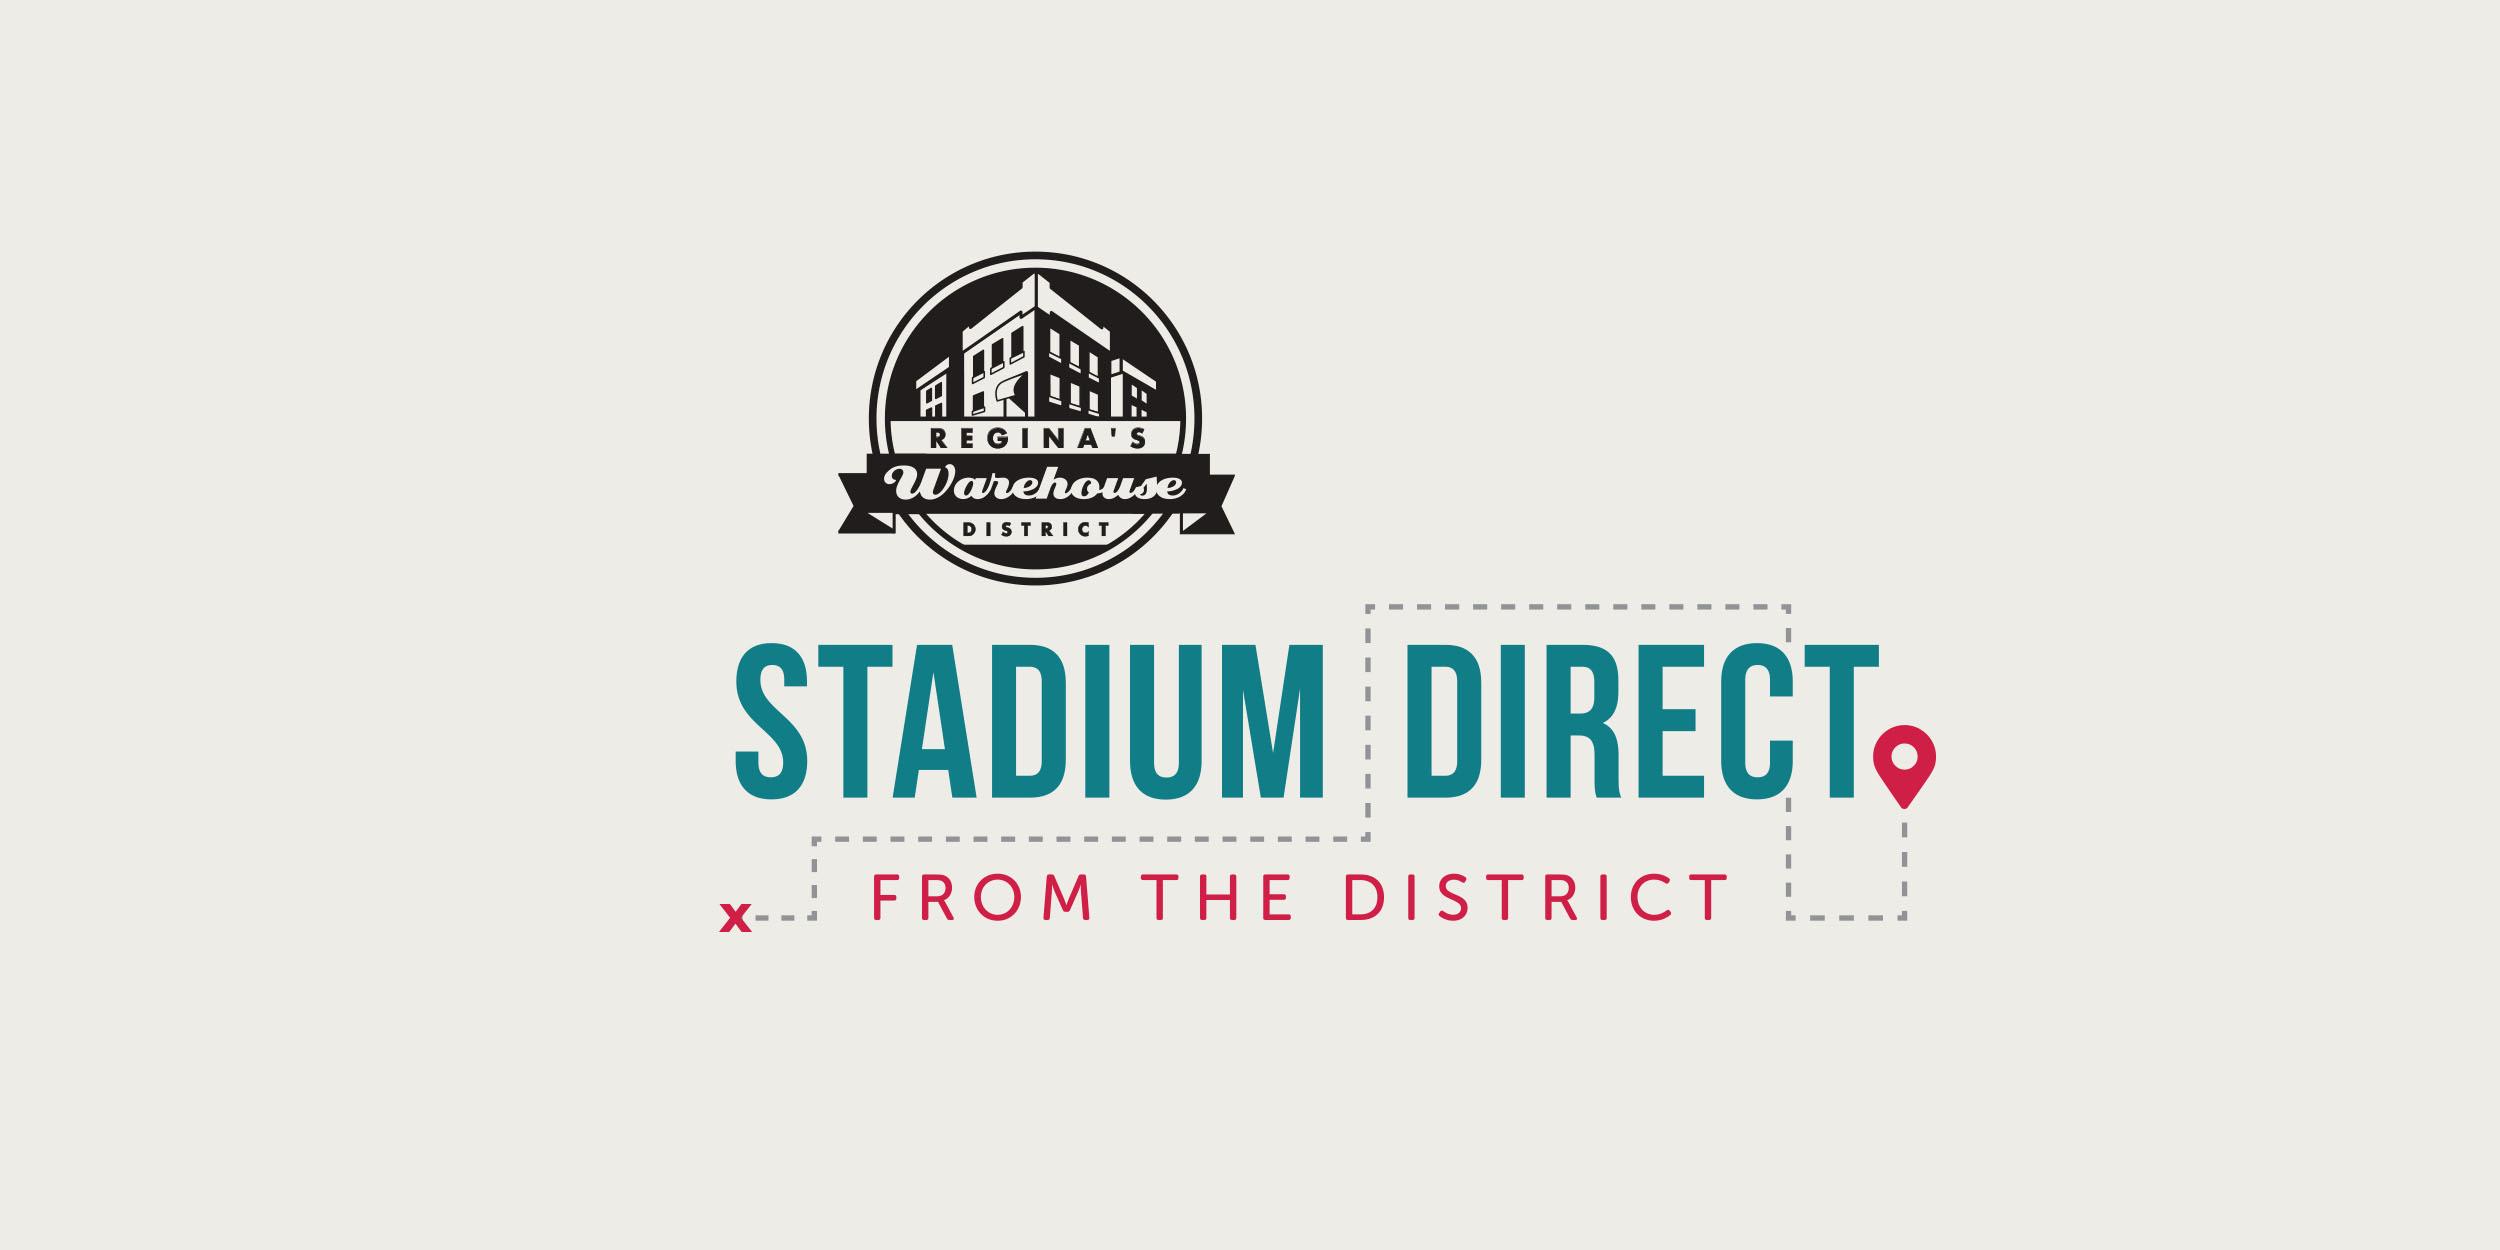 Graphic Design - Advertising Campaign - Stadium Direct - Makewell Creative Co - Regina, SK